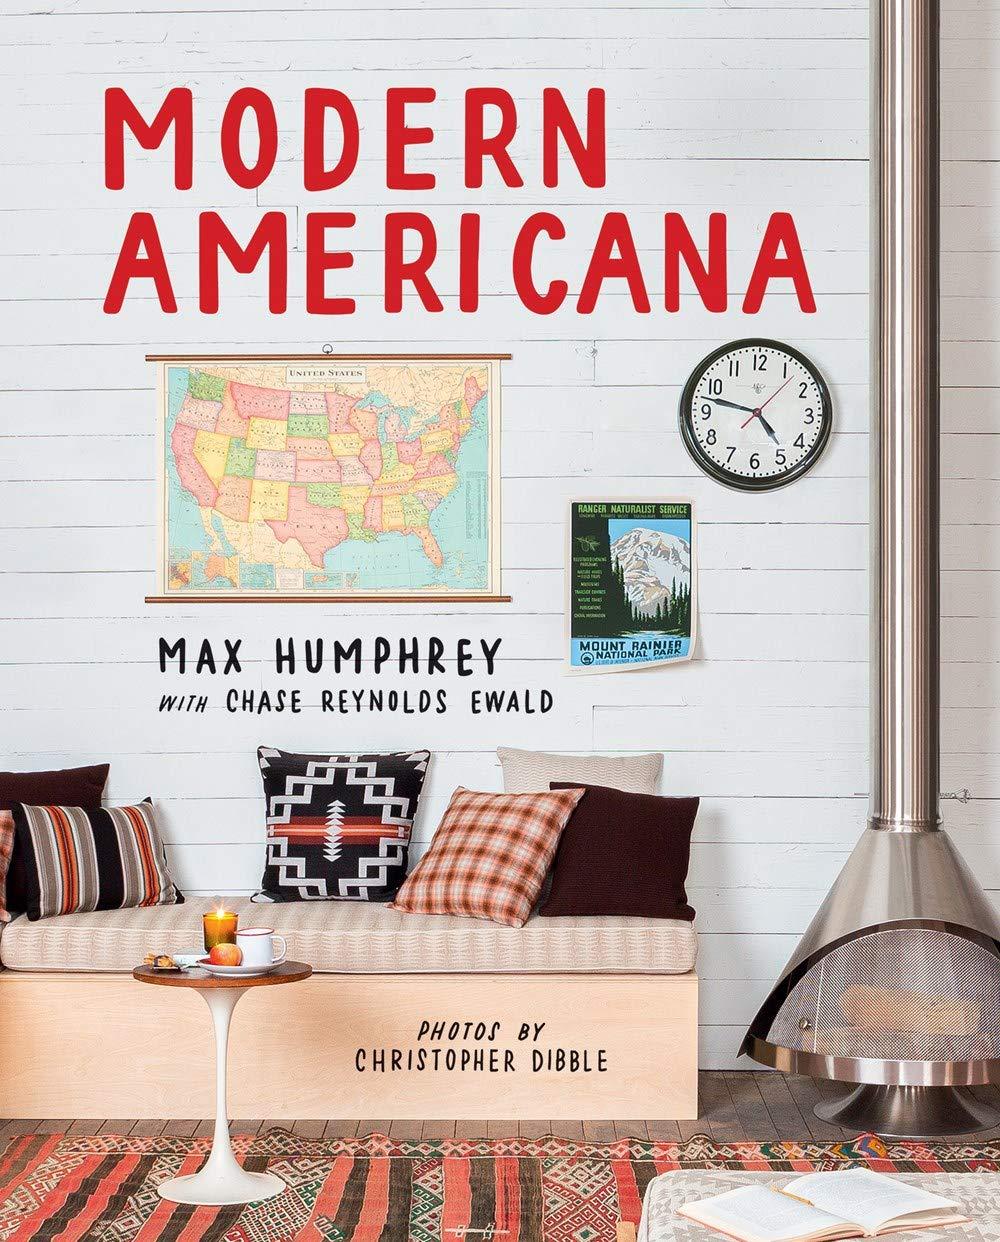 Modern Americana by Max Humphrey